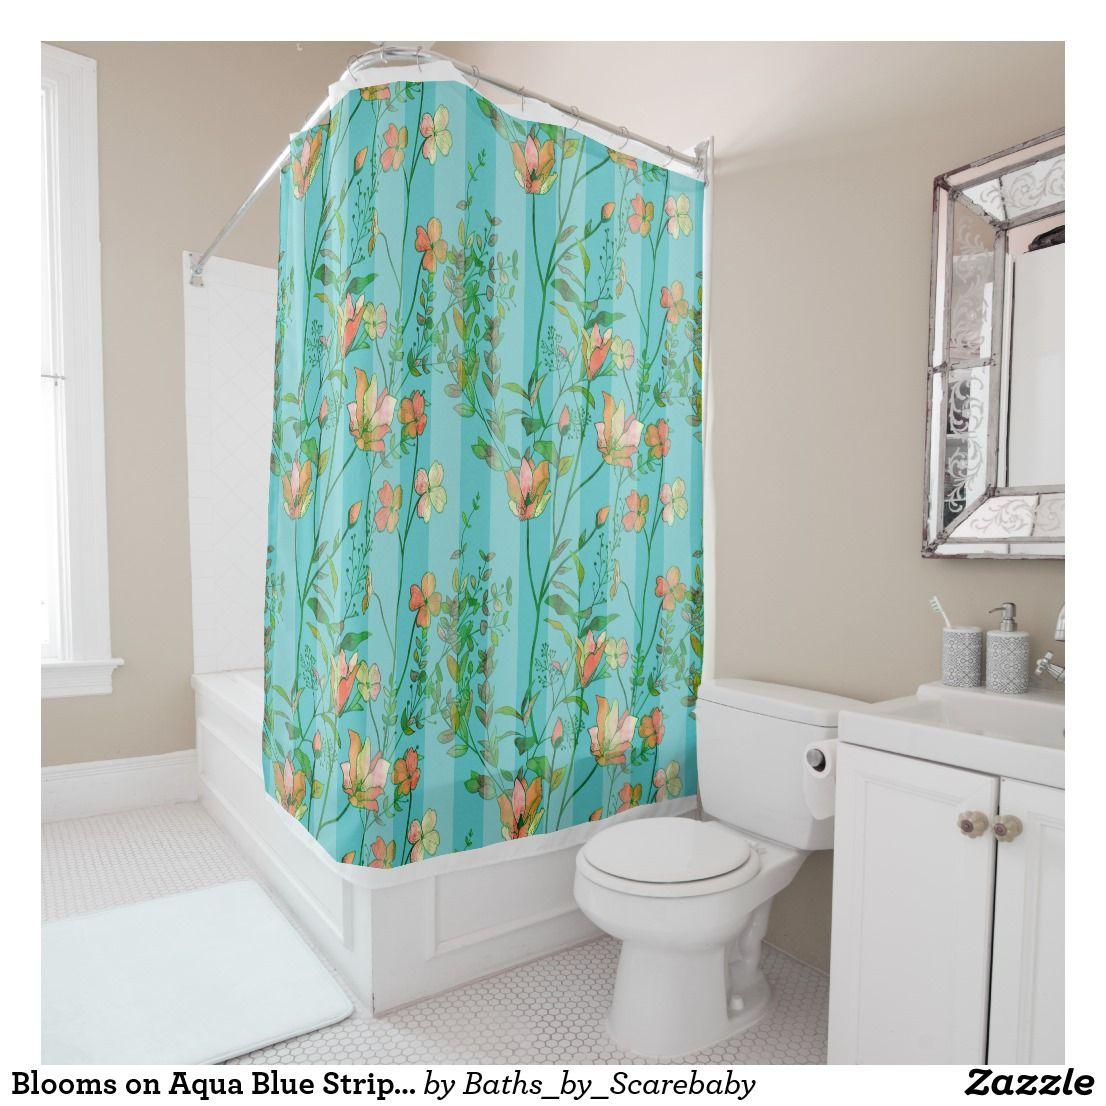 Blooms on aqua blue striped background shower curtain bath